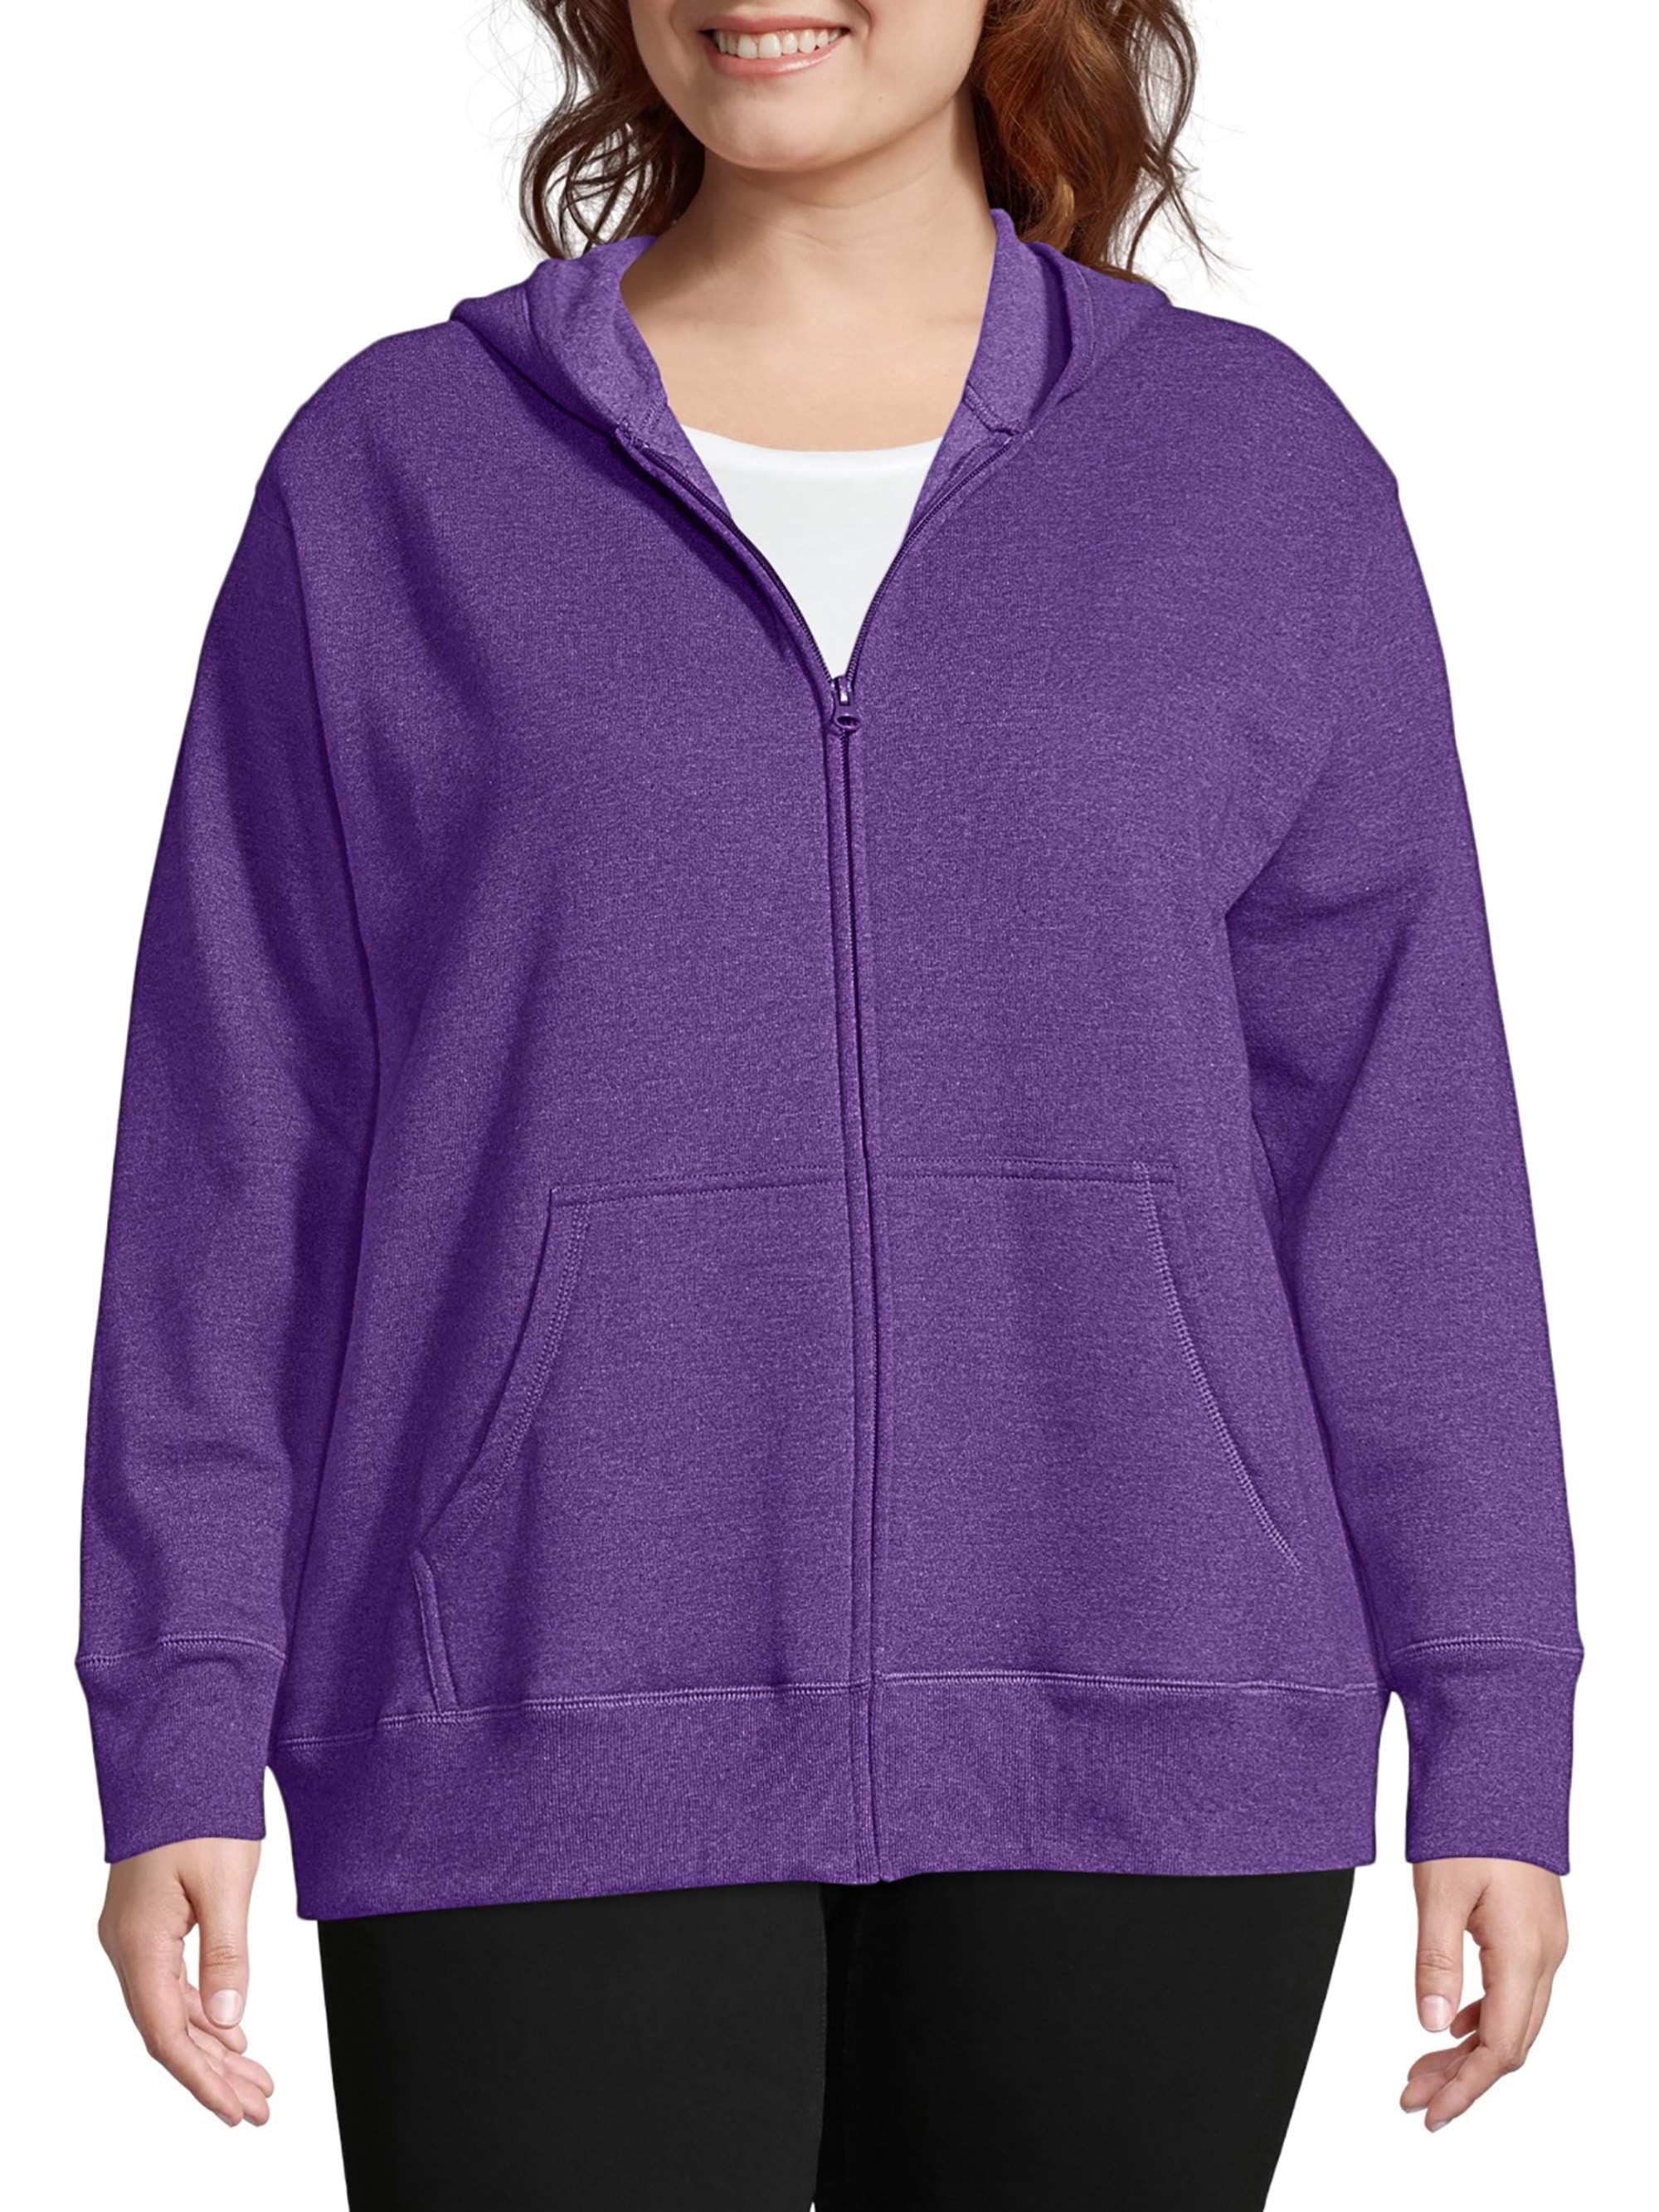 Just My Size Women's Plus-Size Fleece Zip Hood Jacket